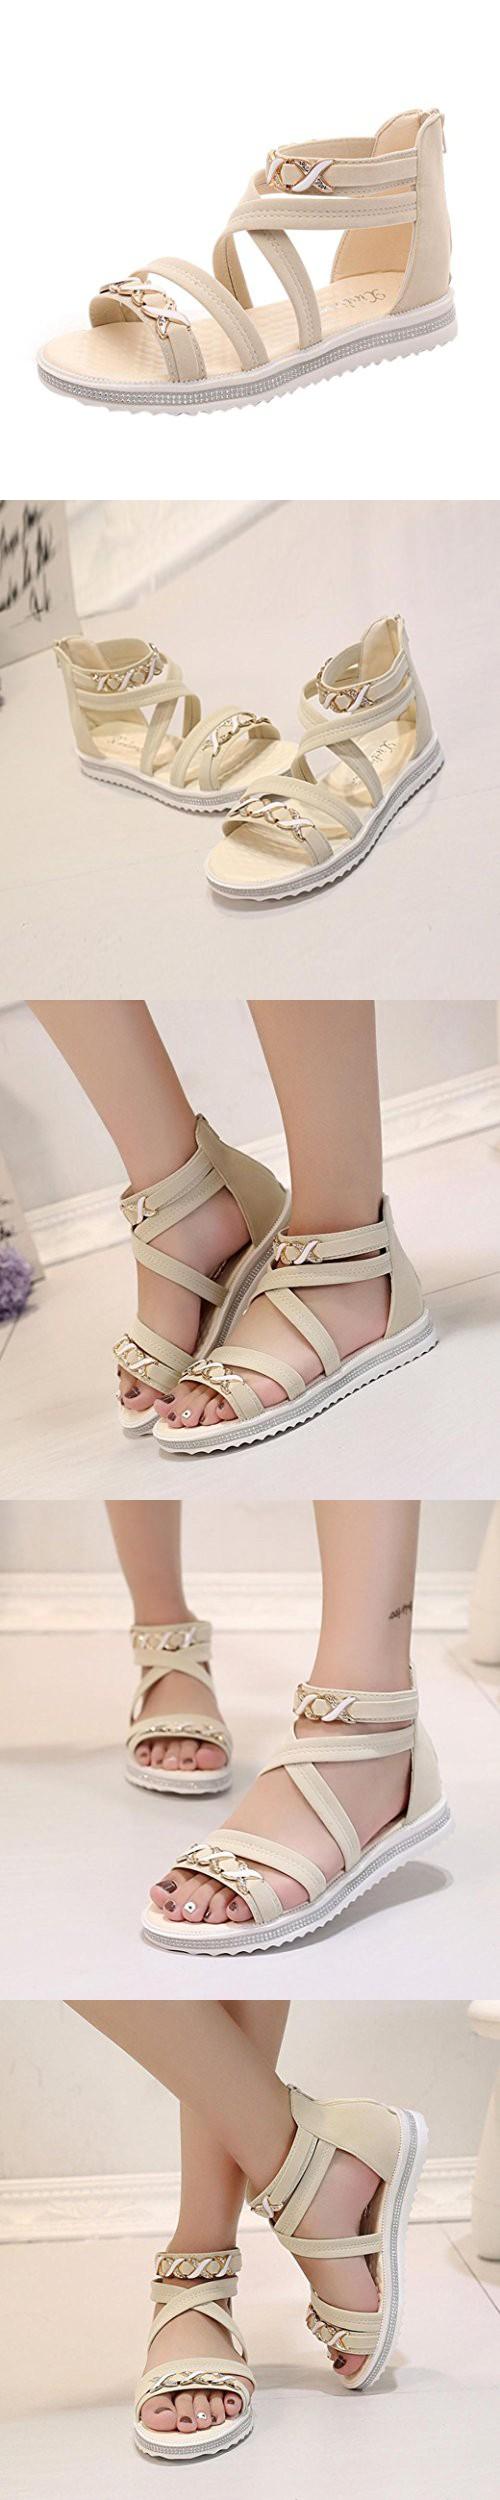 e5e2d5608 Fheaven Women Flat Shoes Summer Soft Leather Leisure Ladies Sandals Strip  Cross Sandals (China size